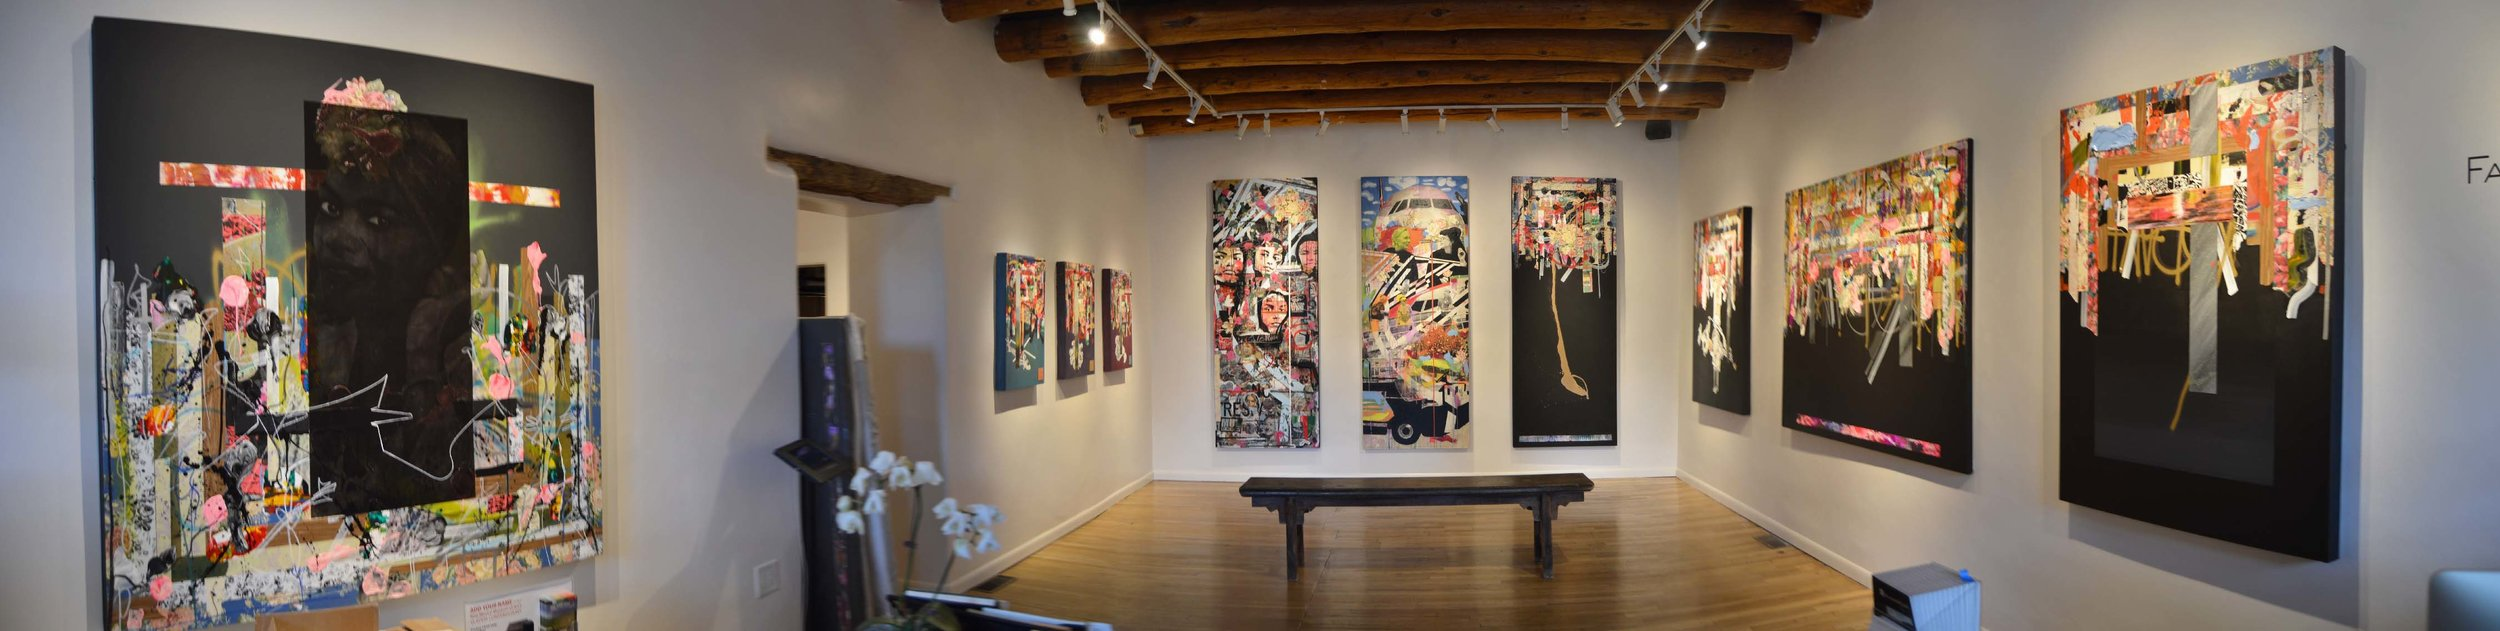 Turner Carroll Gallery show.jpg